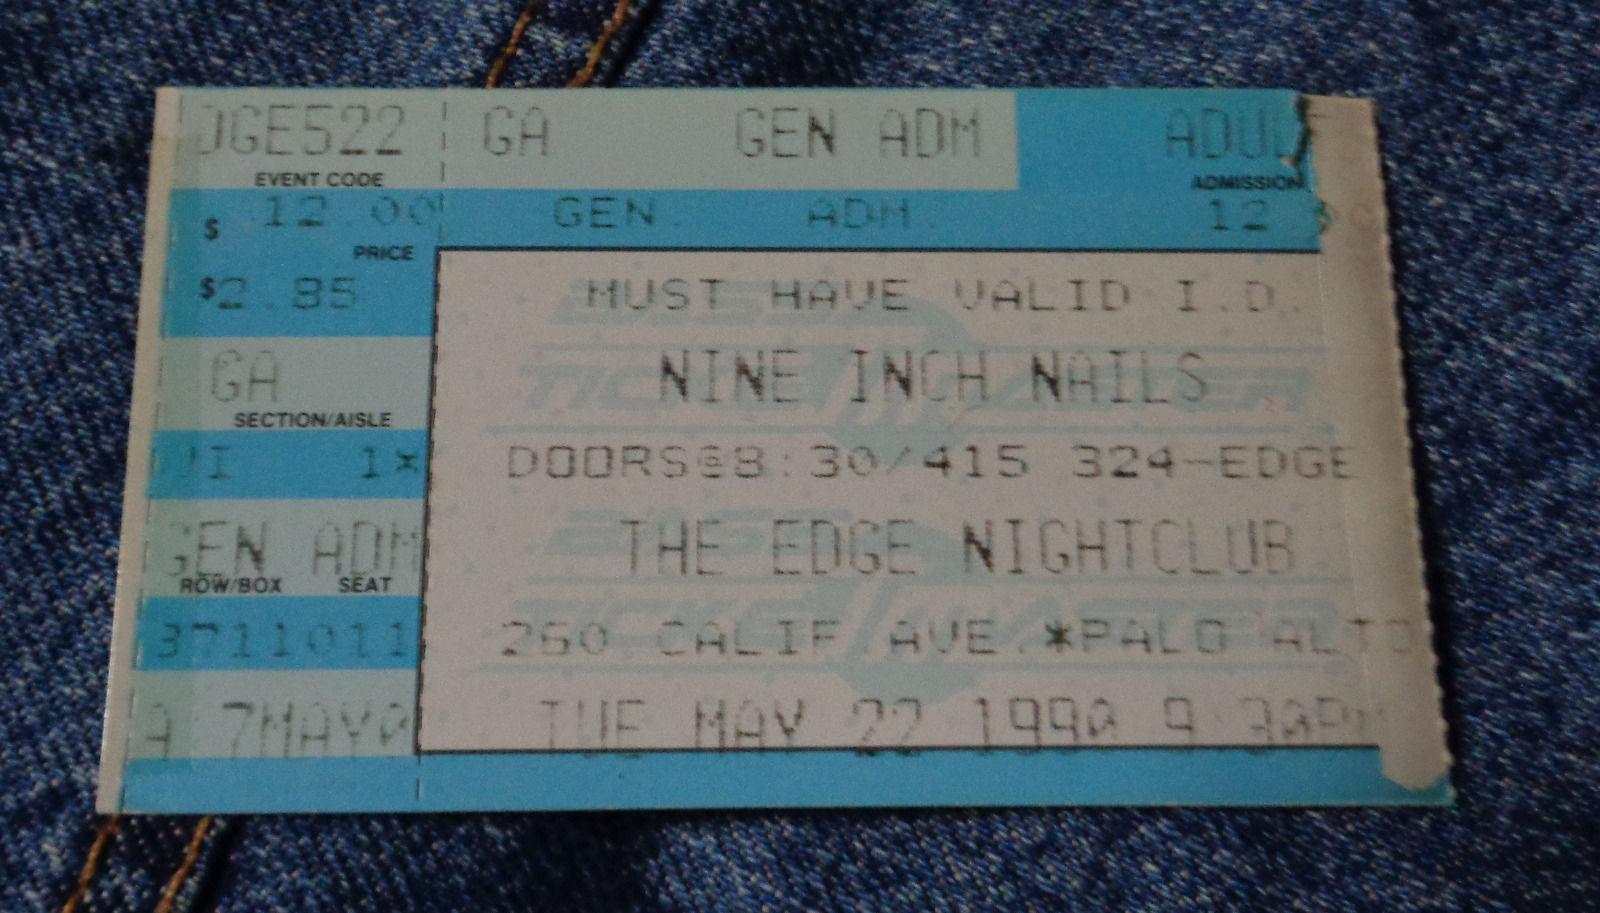 Nine Inch Nails Live Archive: NIN, May 22, 1990, Palo Alto, CA, The Edge